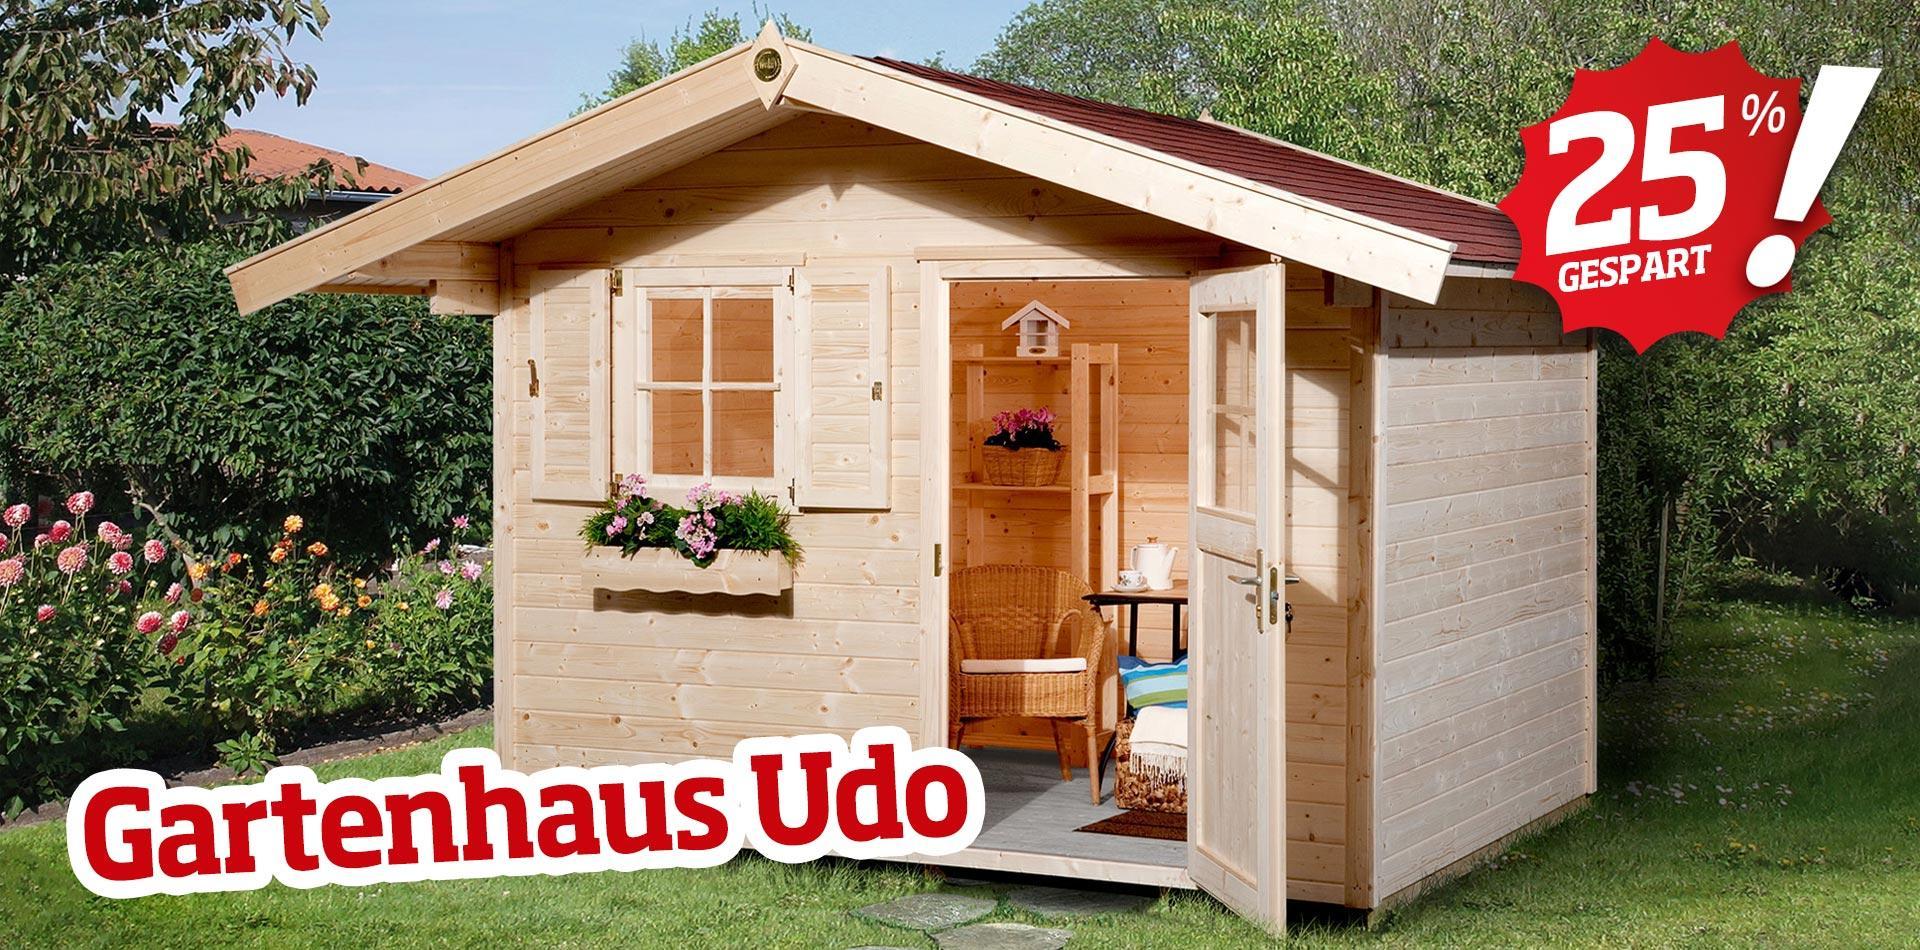 Gartenhaus Holz 3x3m Günstig